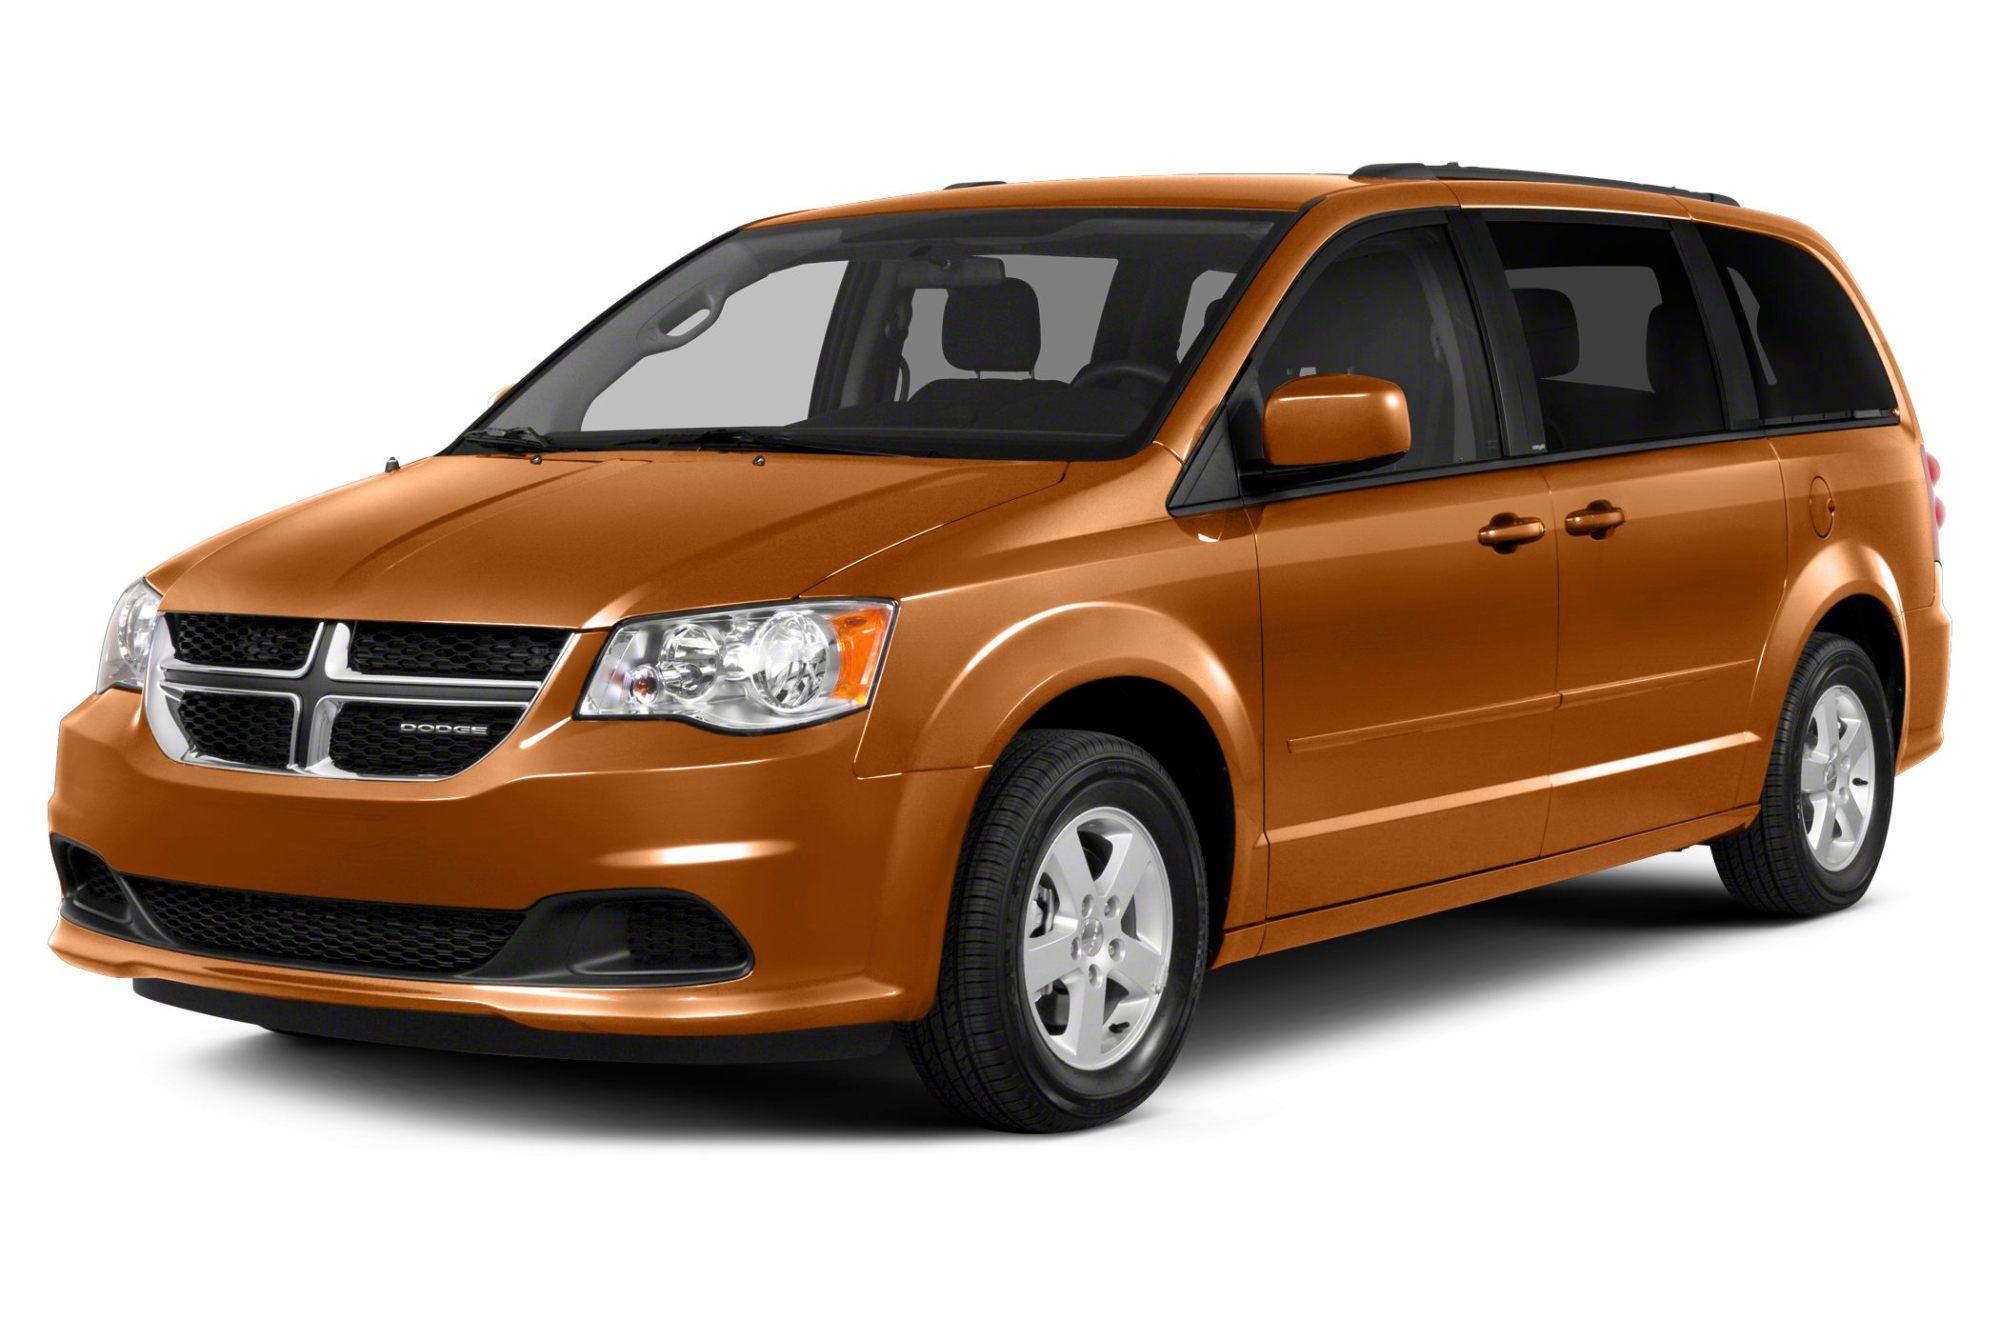 hight resolution of 2012 dodge caravan trailer wiring harnes